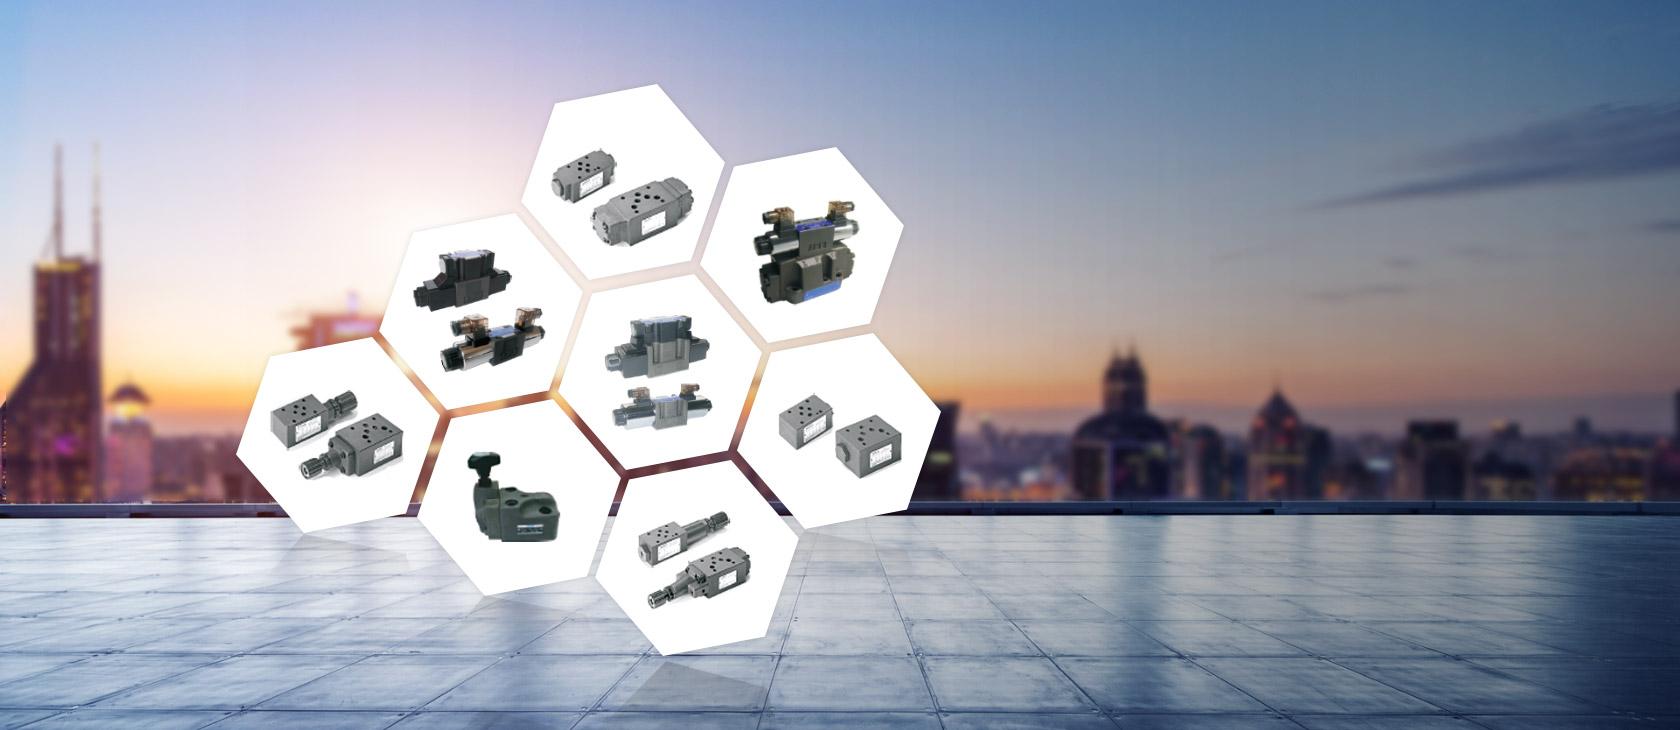 Hydraulic Valves from Seven Ocean Hydraulics